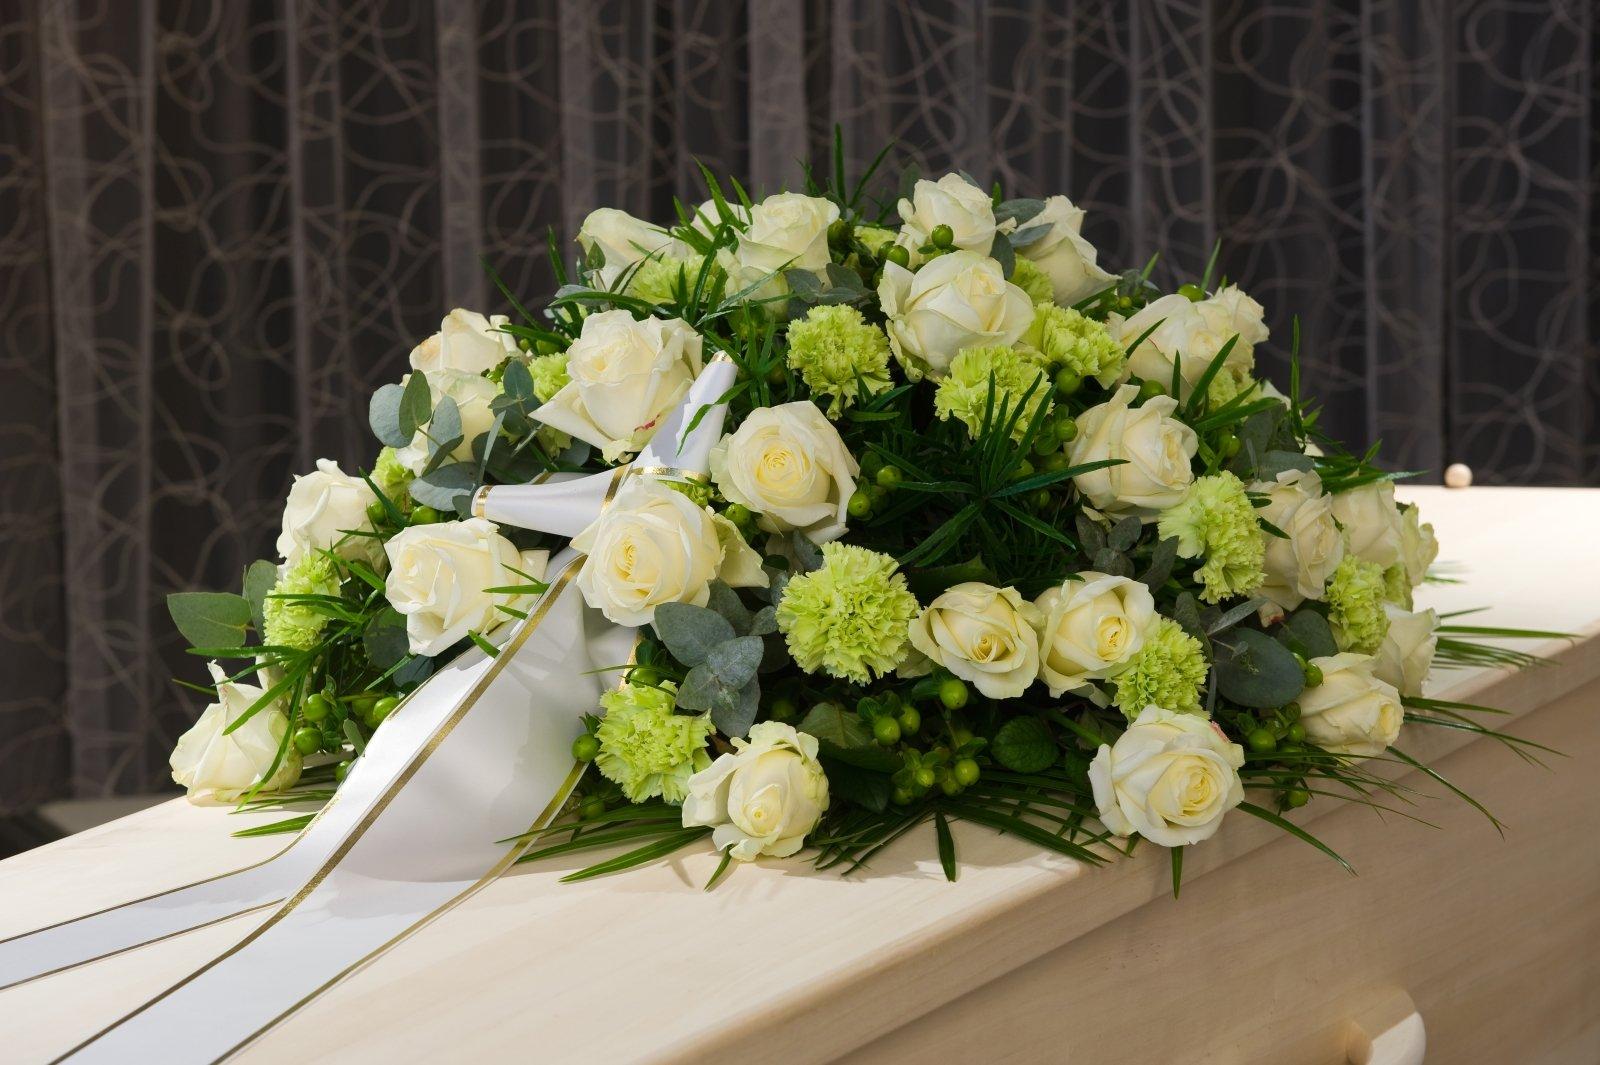 corone di rose e garofani gialli